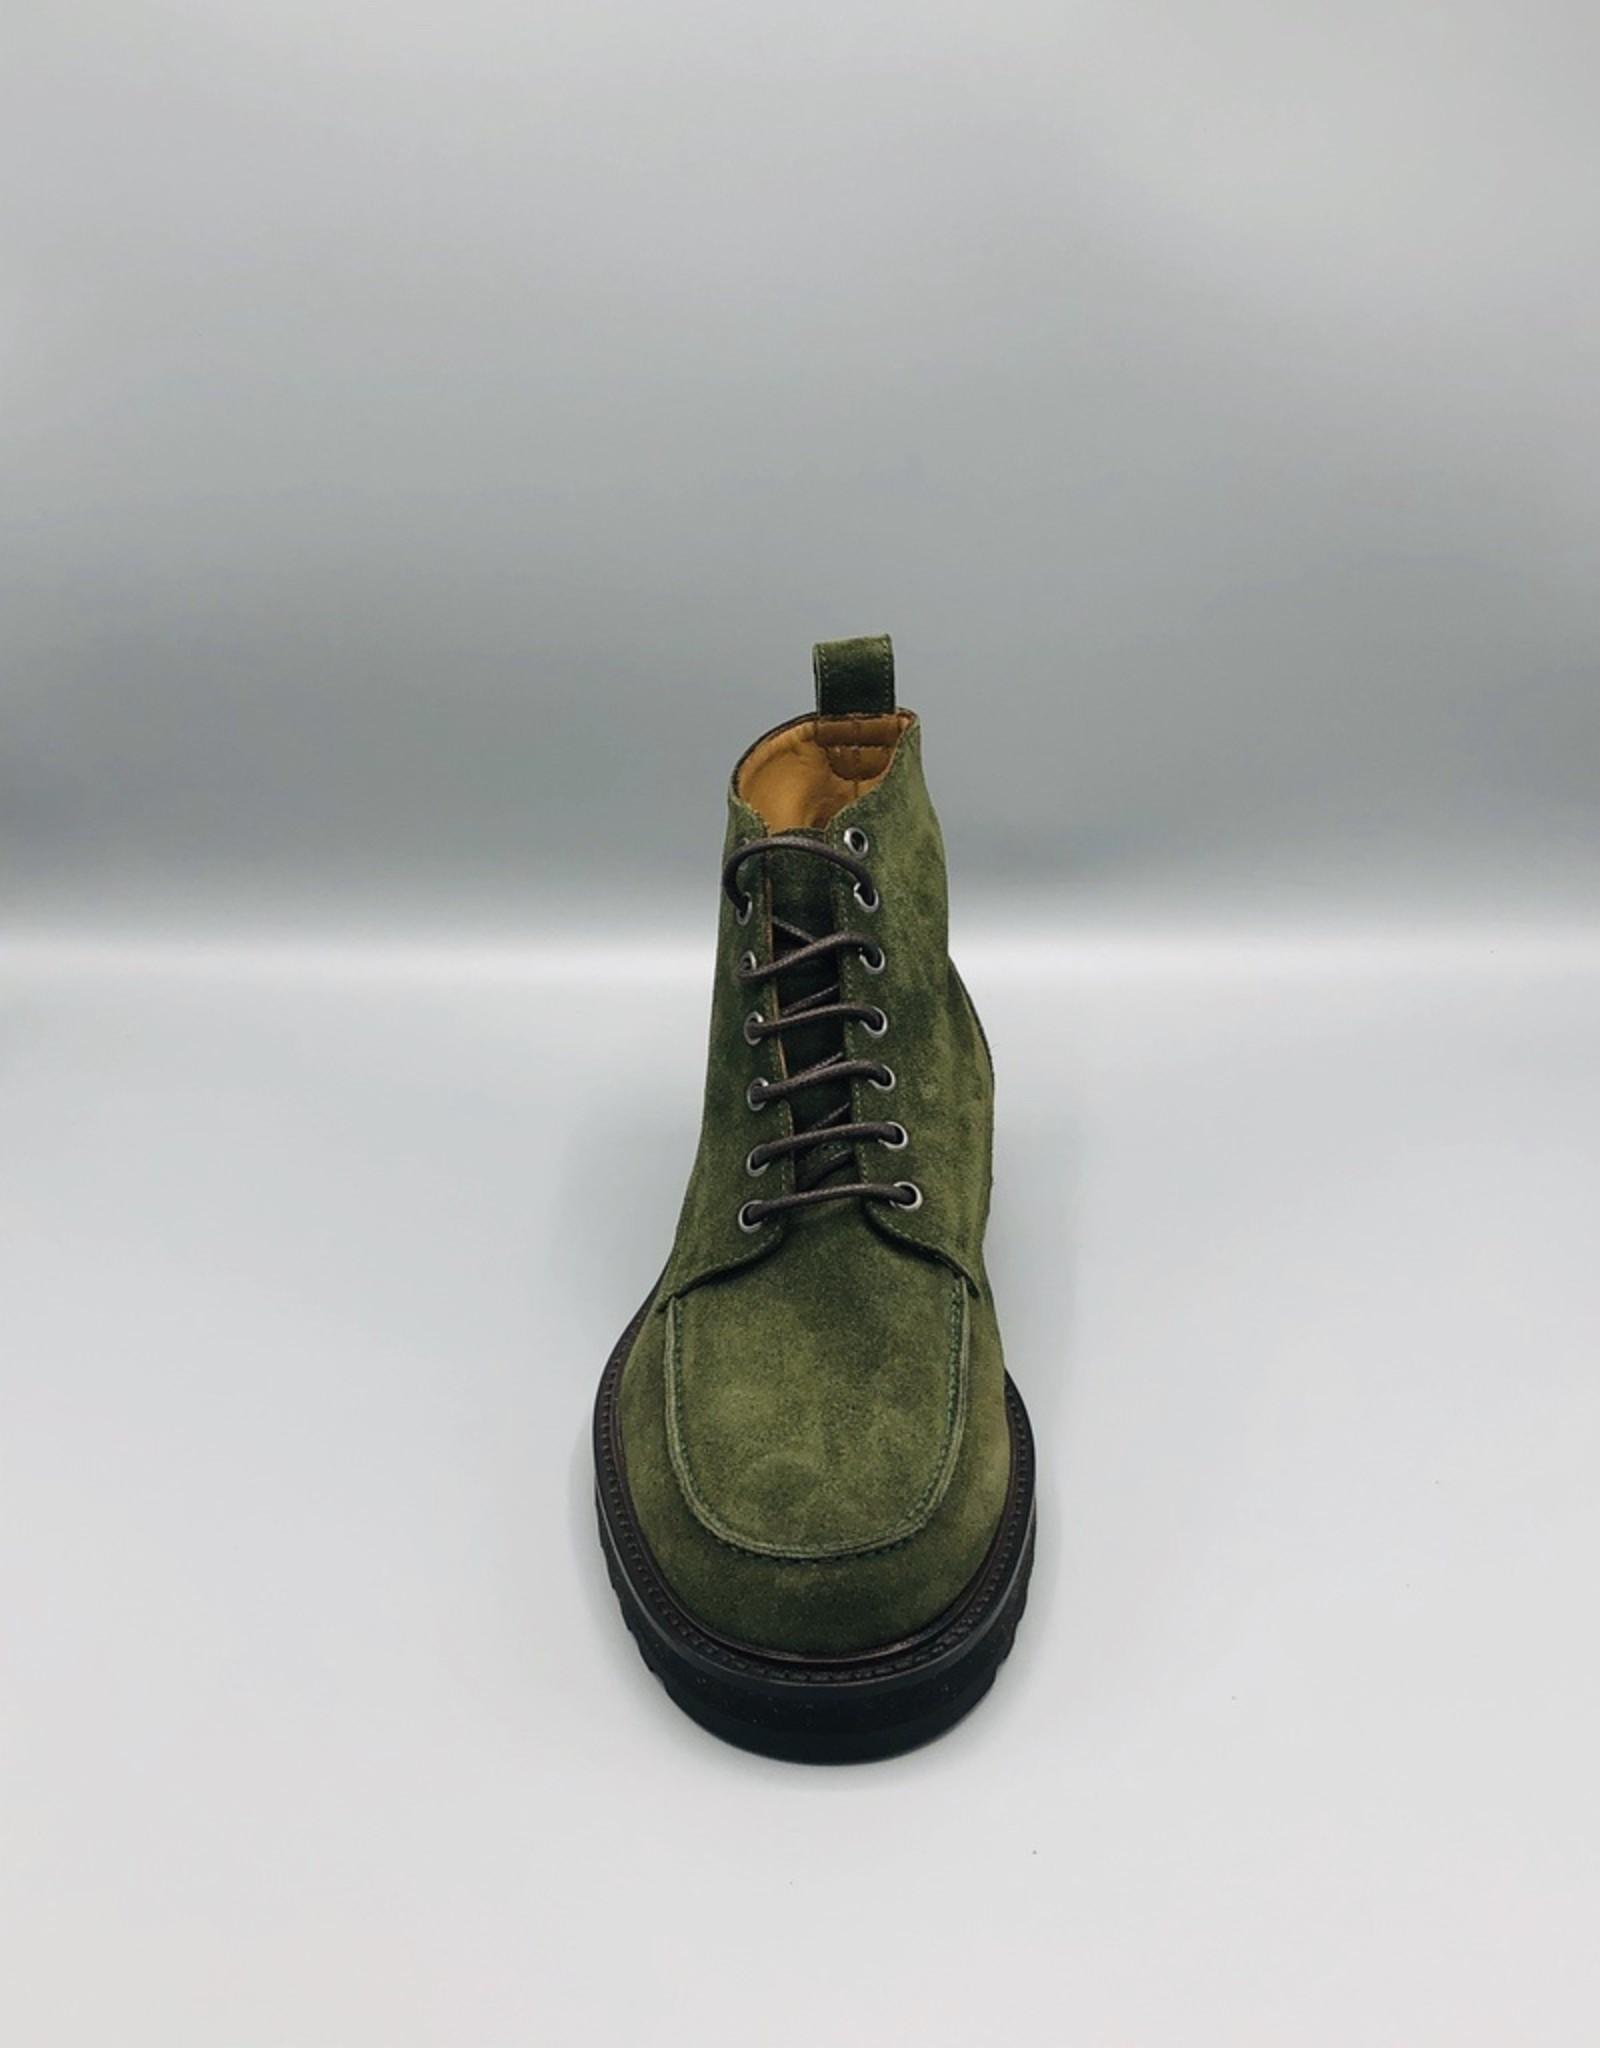 Manovie Toscane Manovie Toscane Silvio Lace Up Suede Ankle Boots